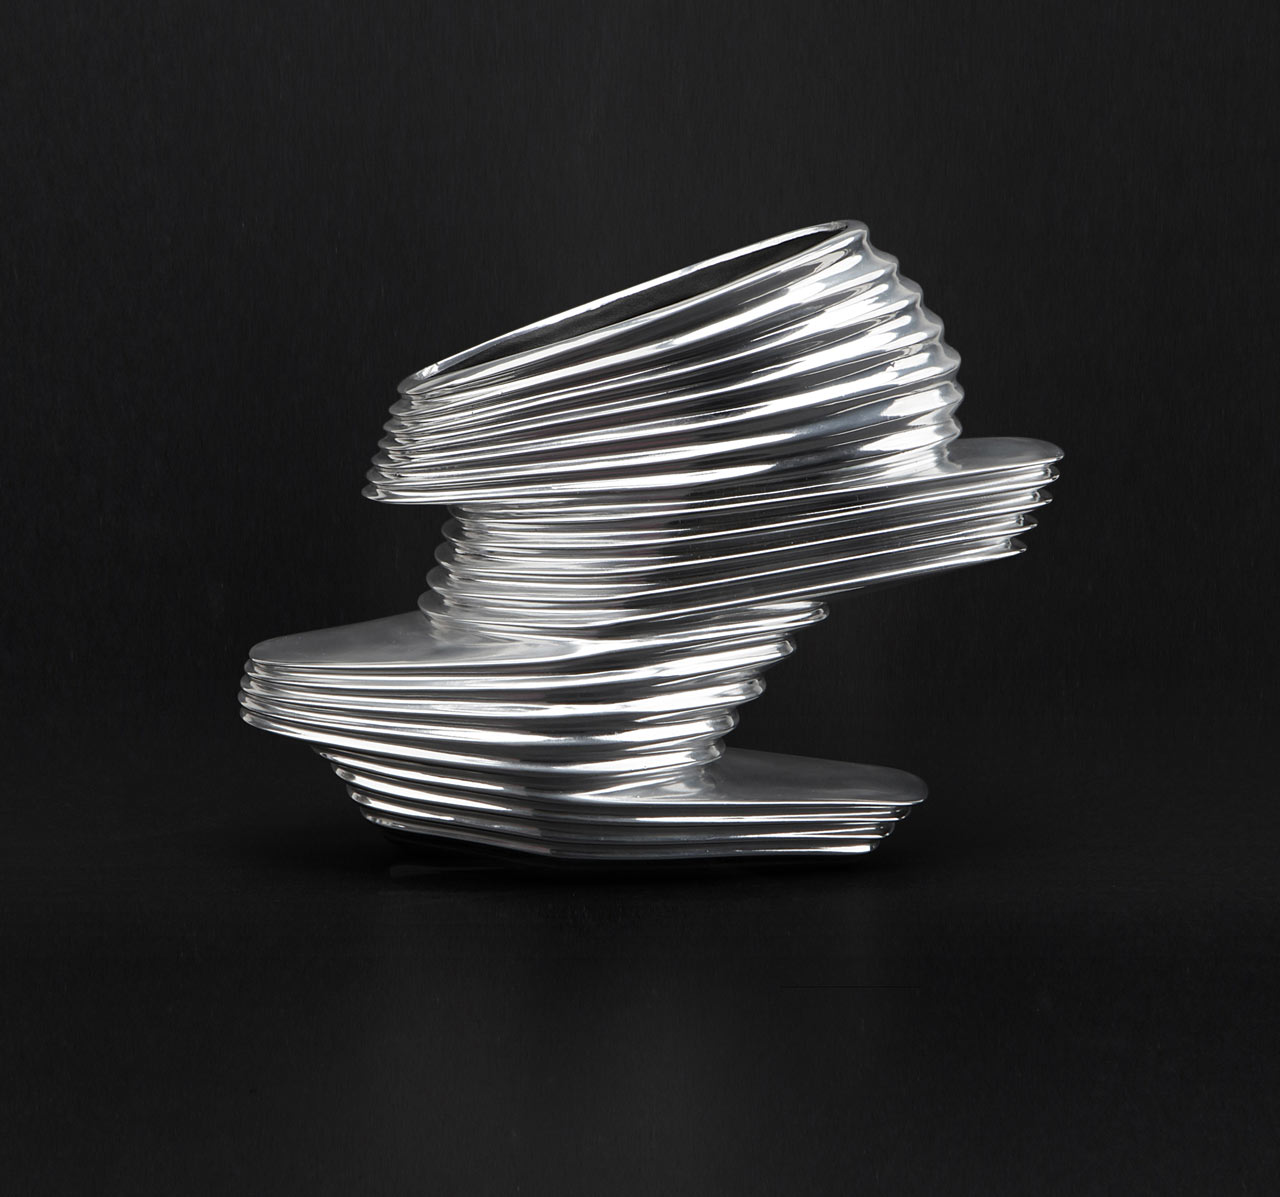 koolhaas takes on bad design villains in la design milk